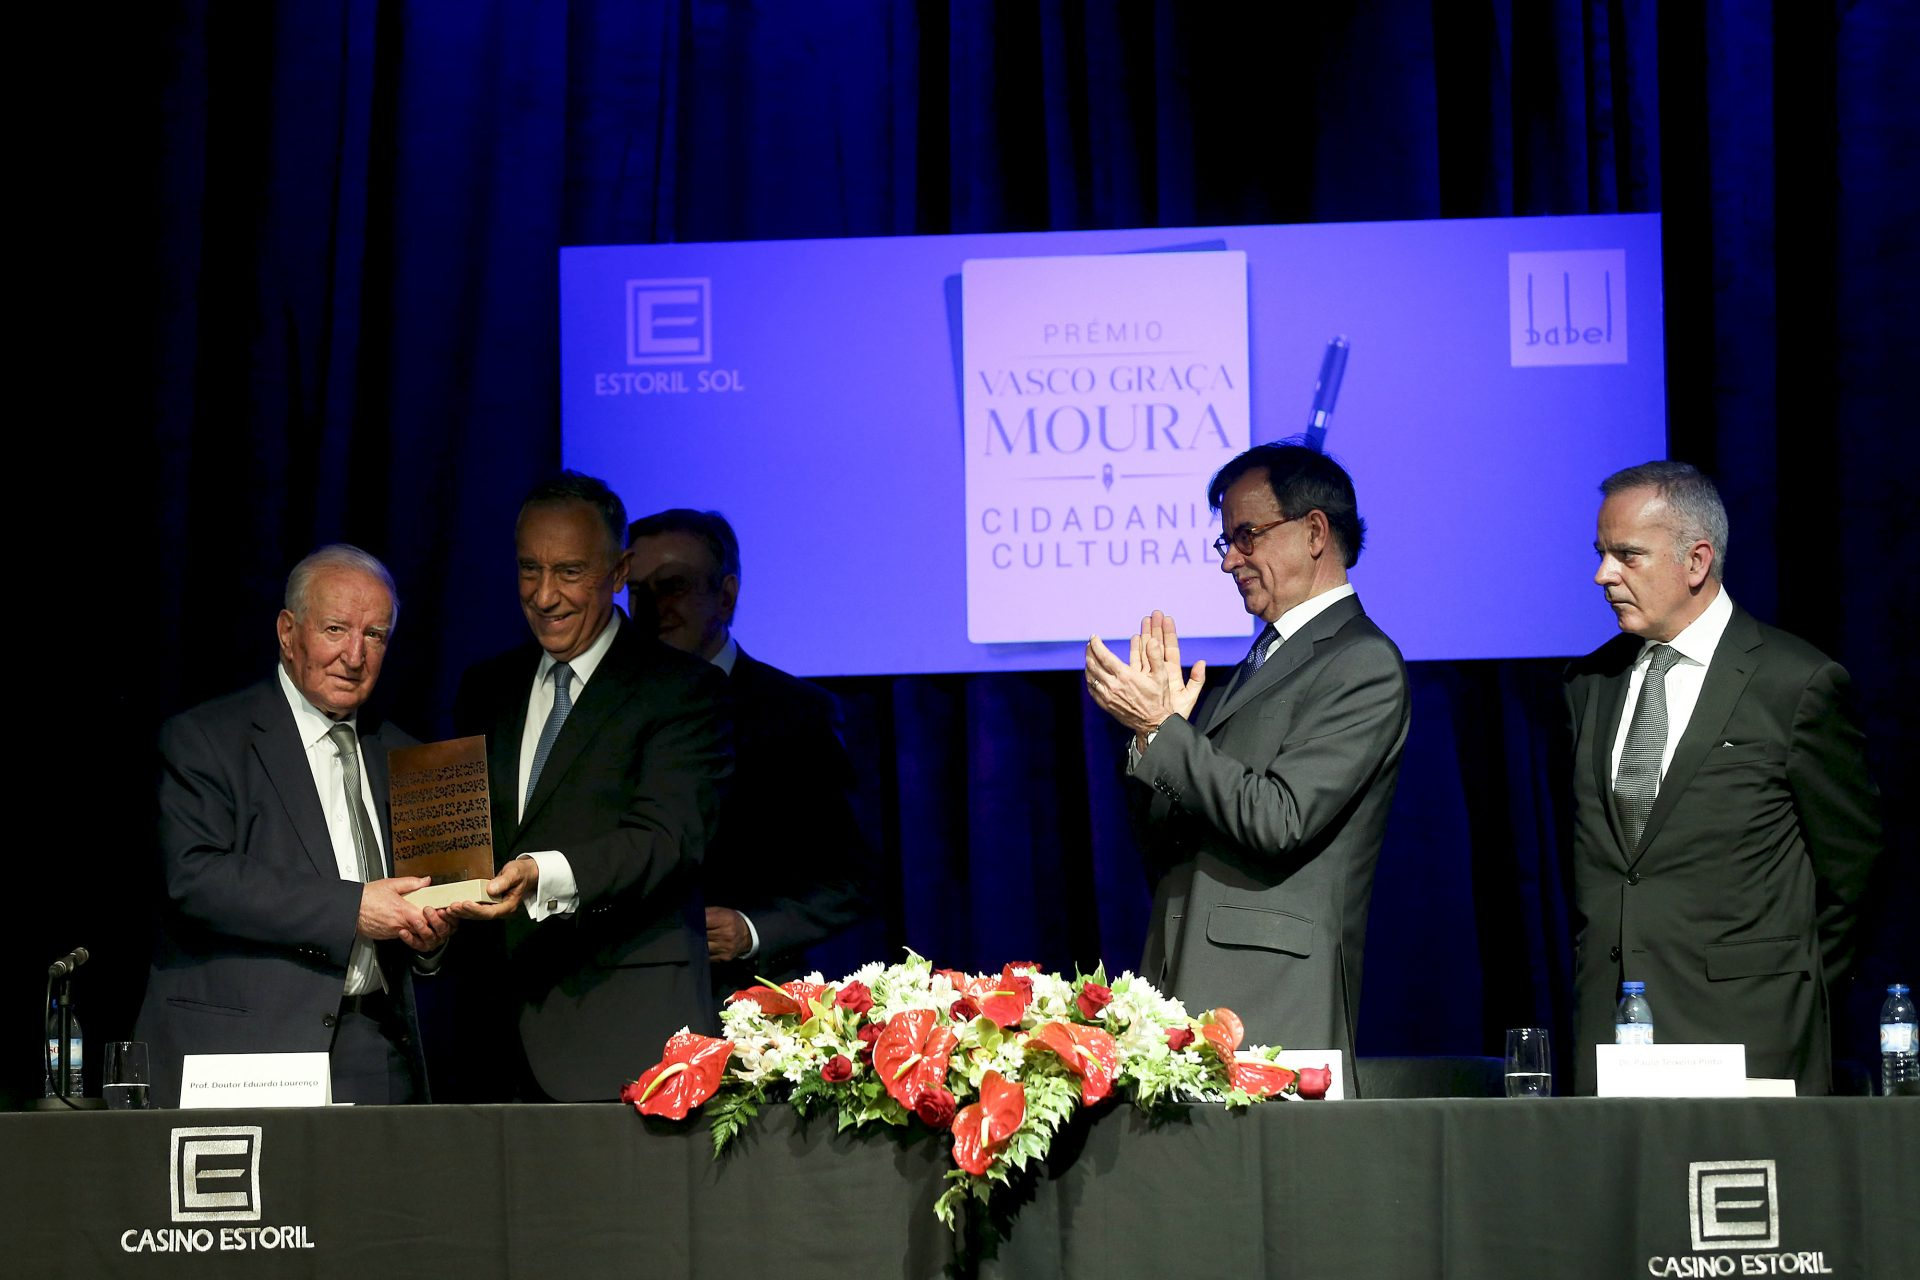 Eduardo Lourenço recebe prémio Vasco Graça Moura